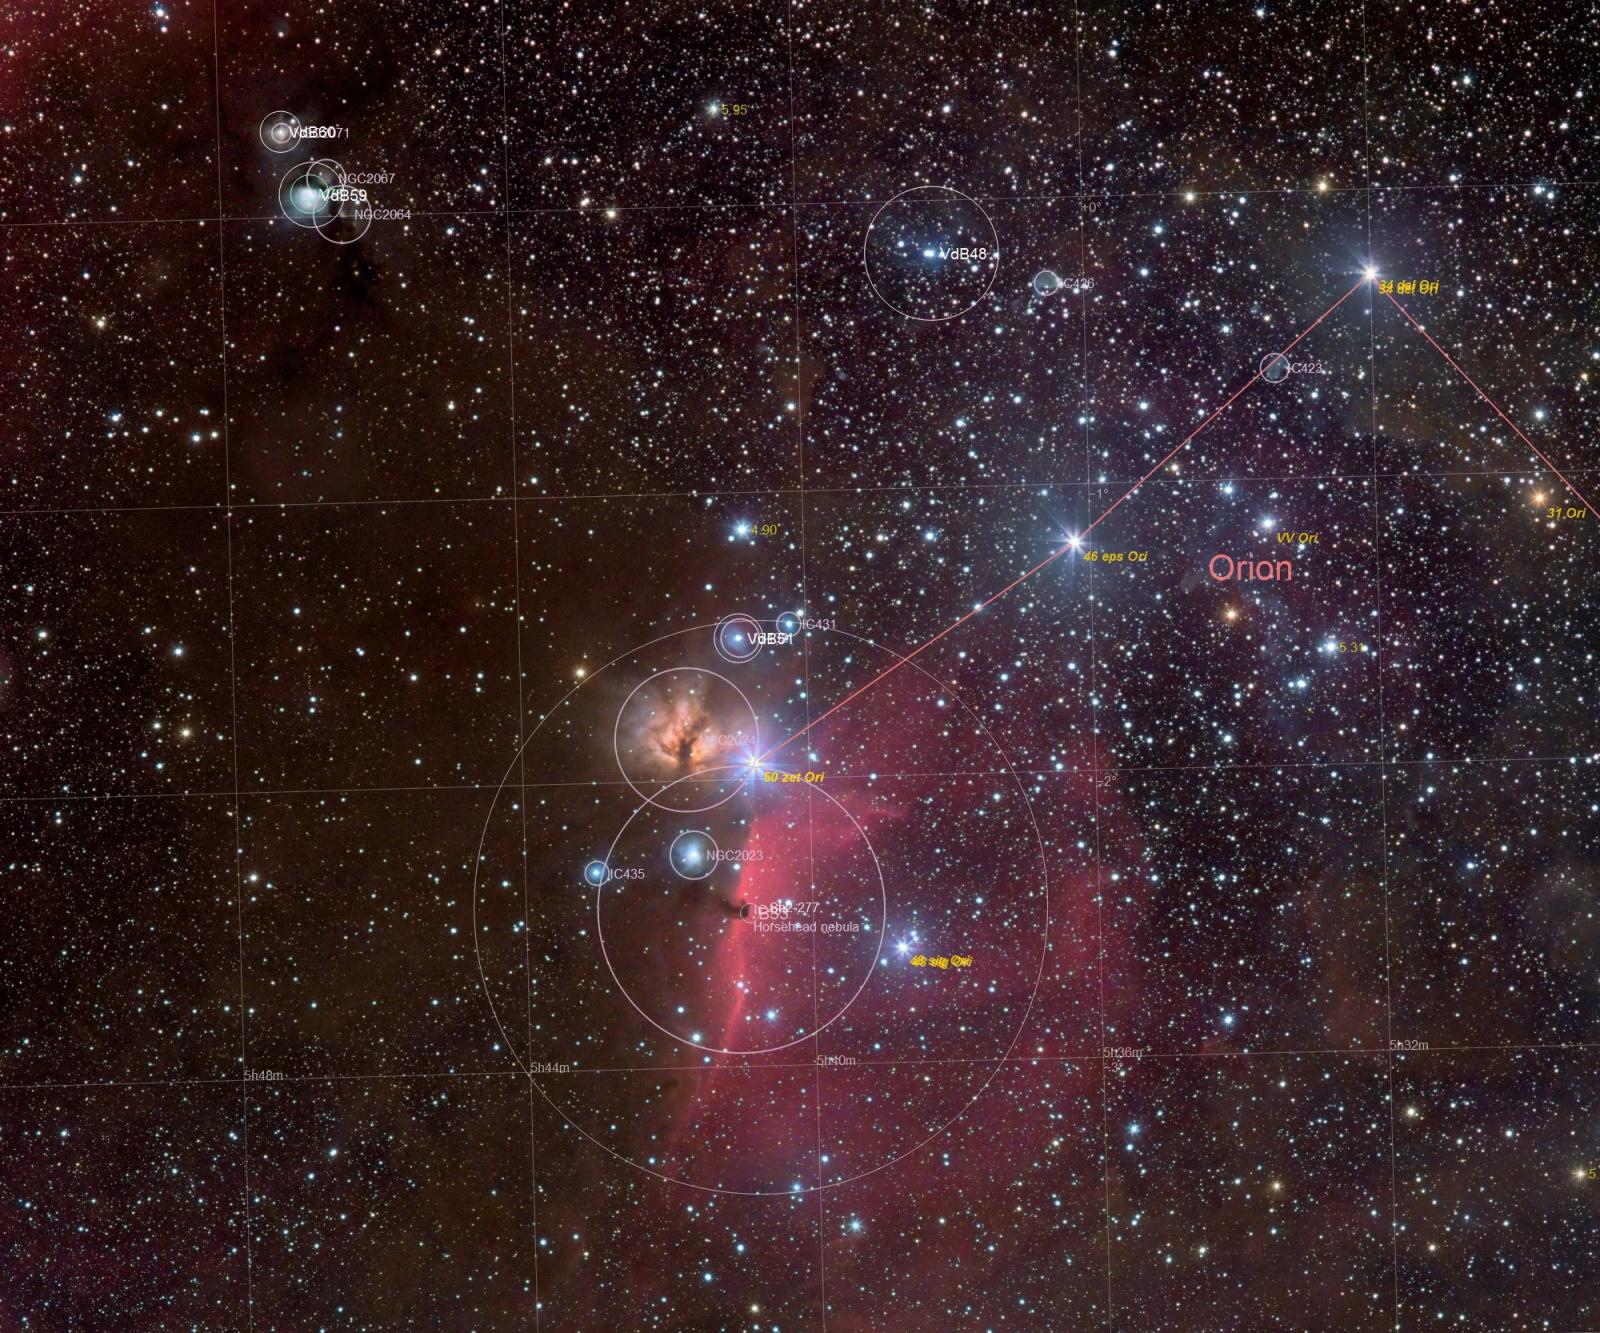 OrionBelt_2019_Asi6D_2000_Annotated.thumb.jpg.d45c4255668bd4cf631595b1ea55b491.jpg